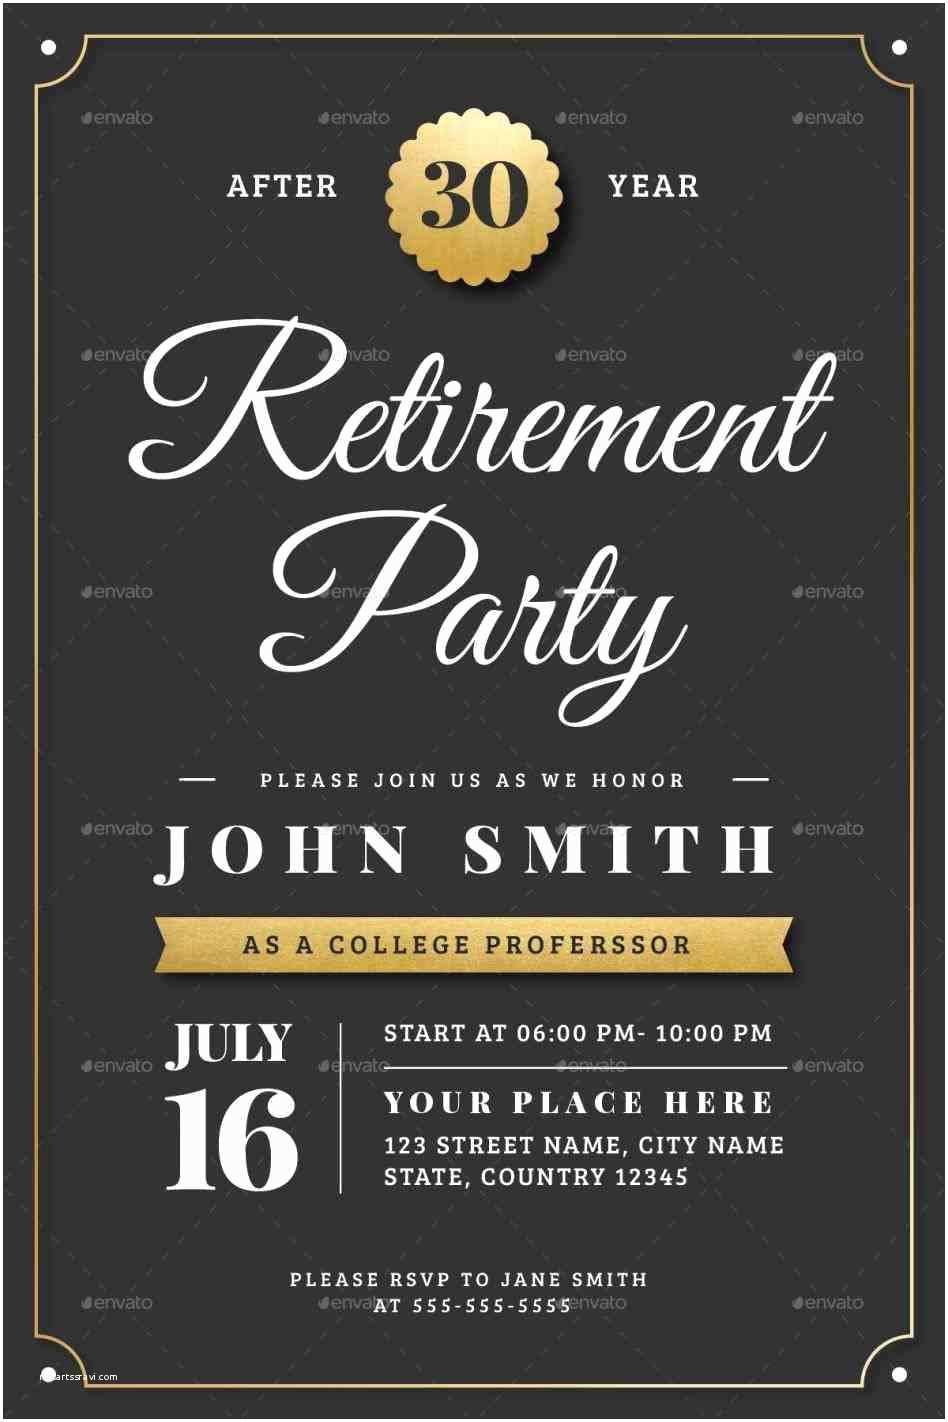 Free Retirement Invitation Templates Powerpoint Templates Free Download Retirement Choice Image